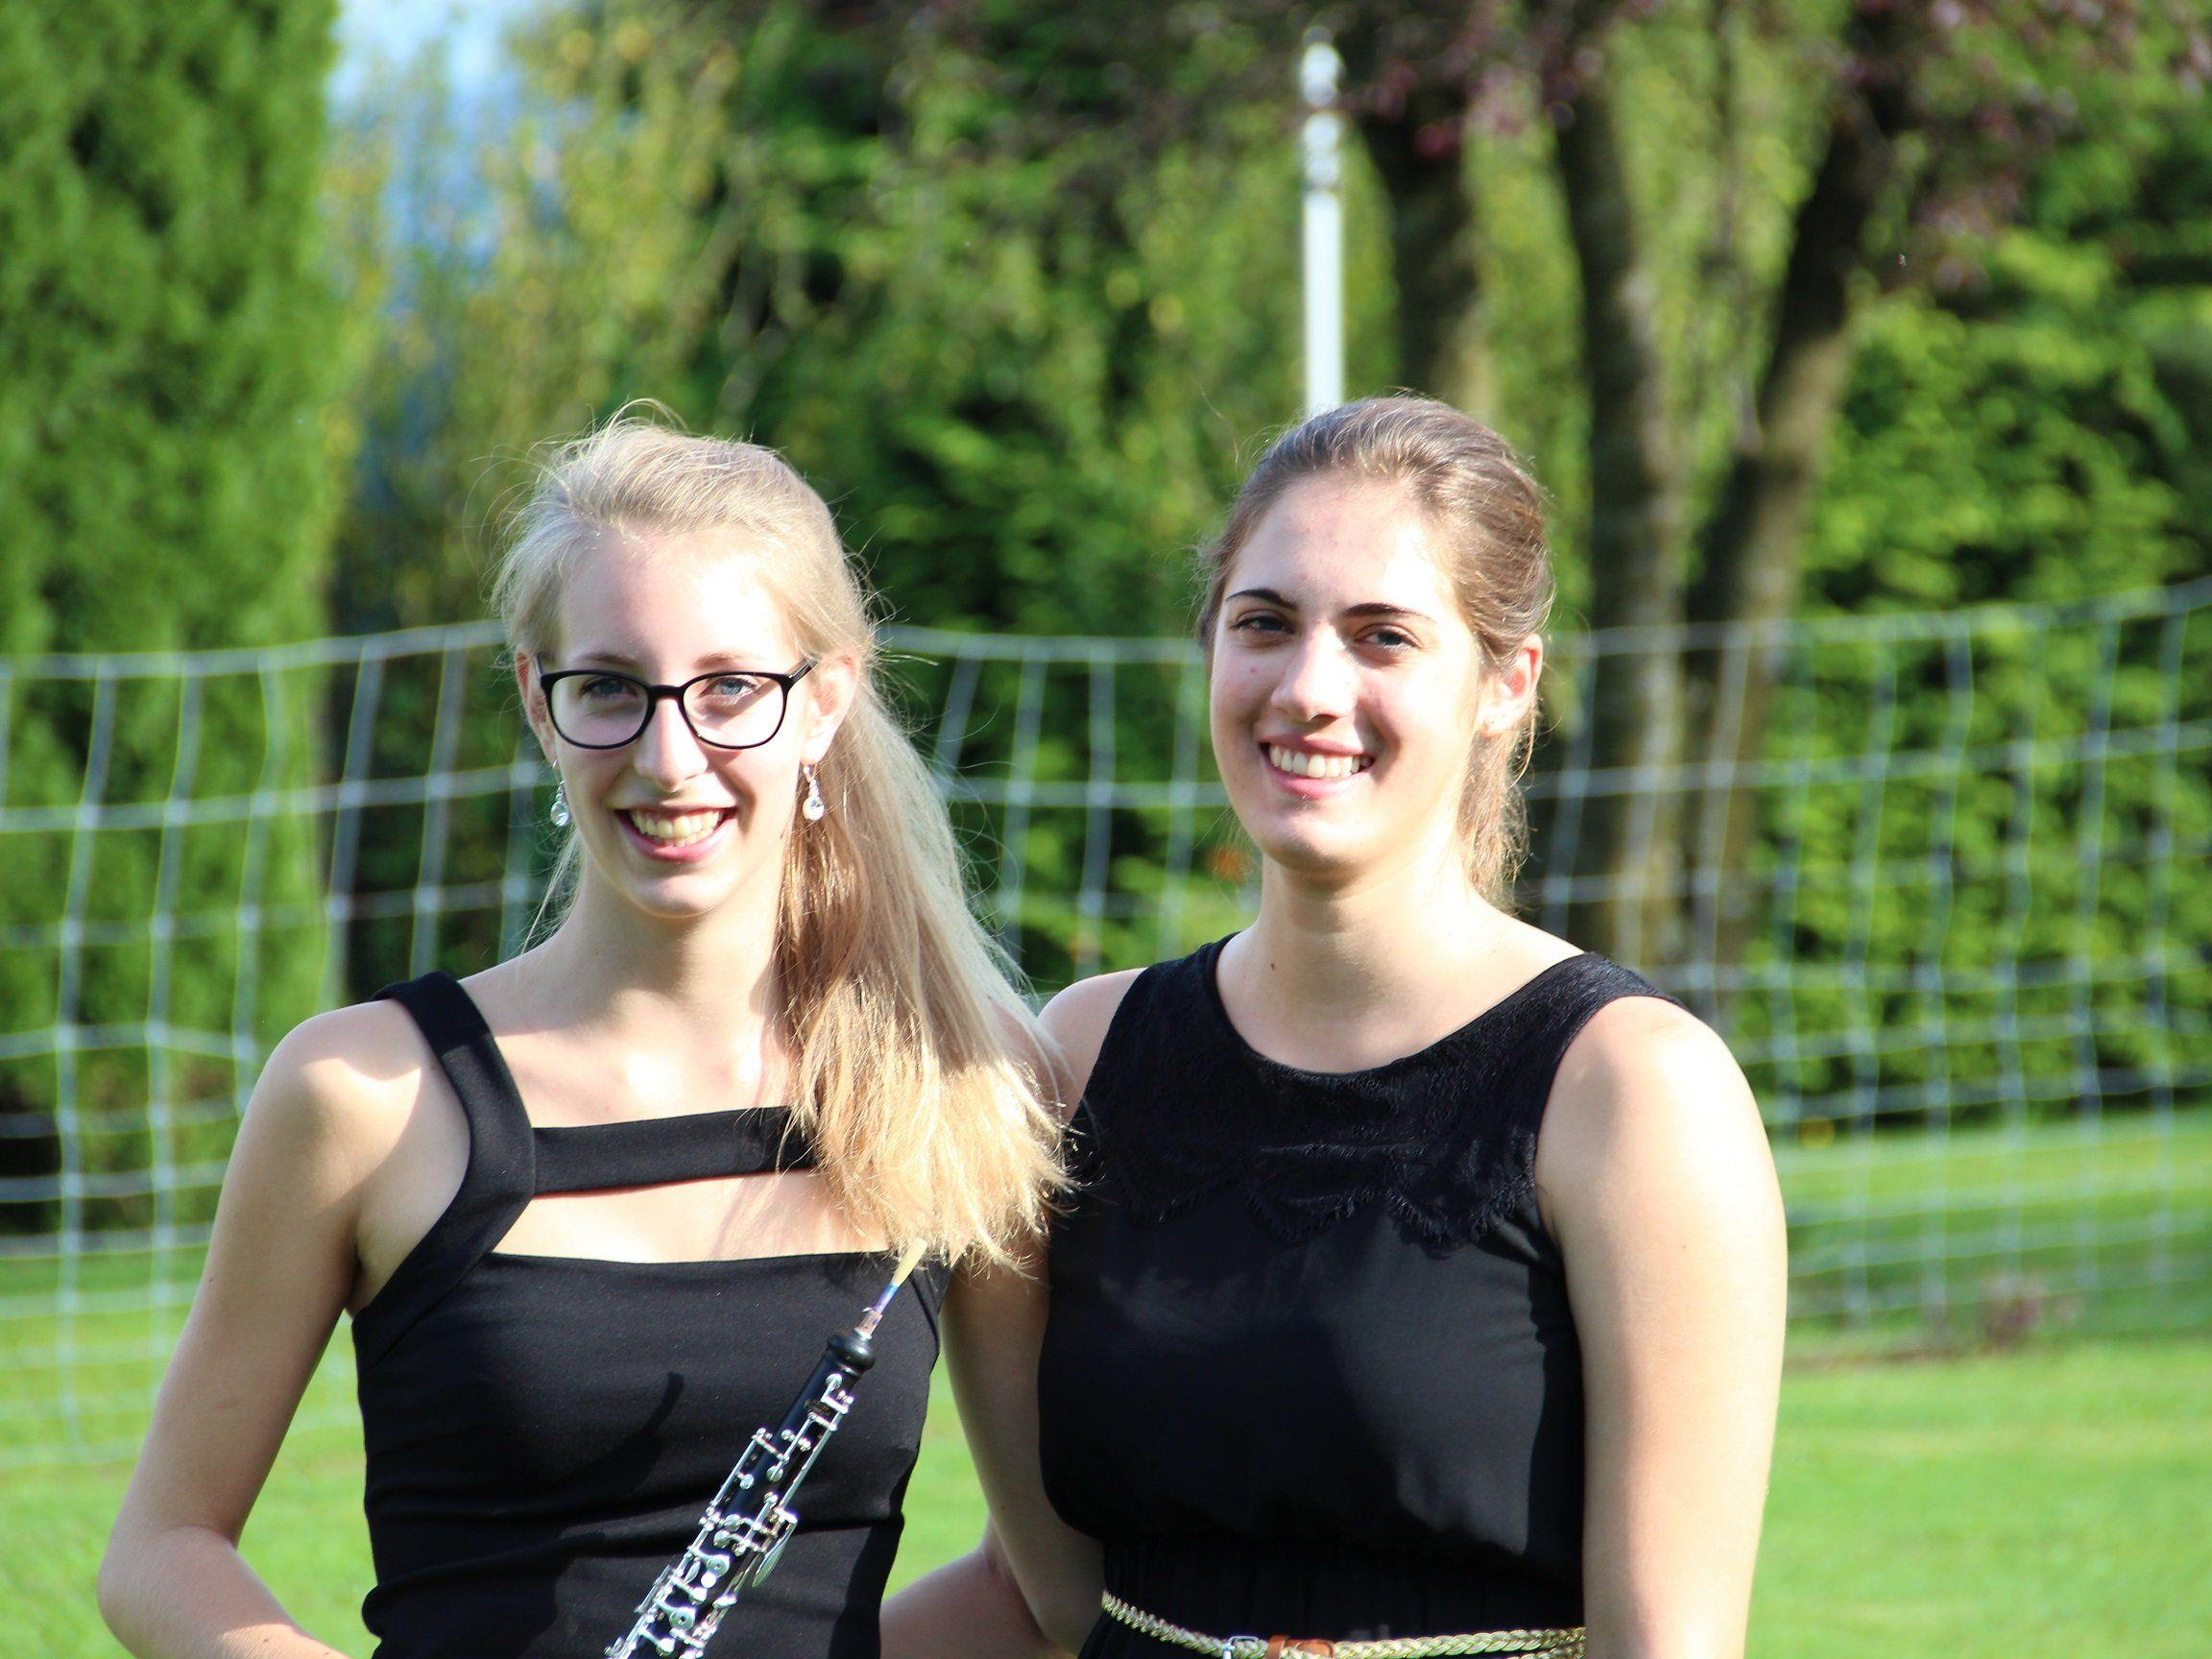 Anja Ebenhoch und Isolde Deleyto Rösner